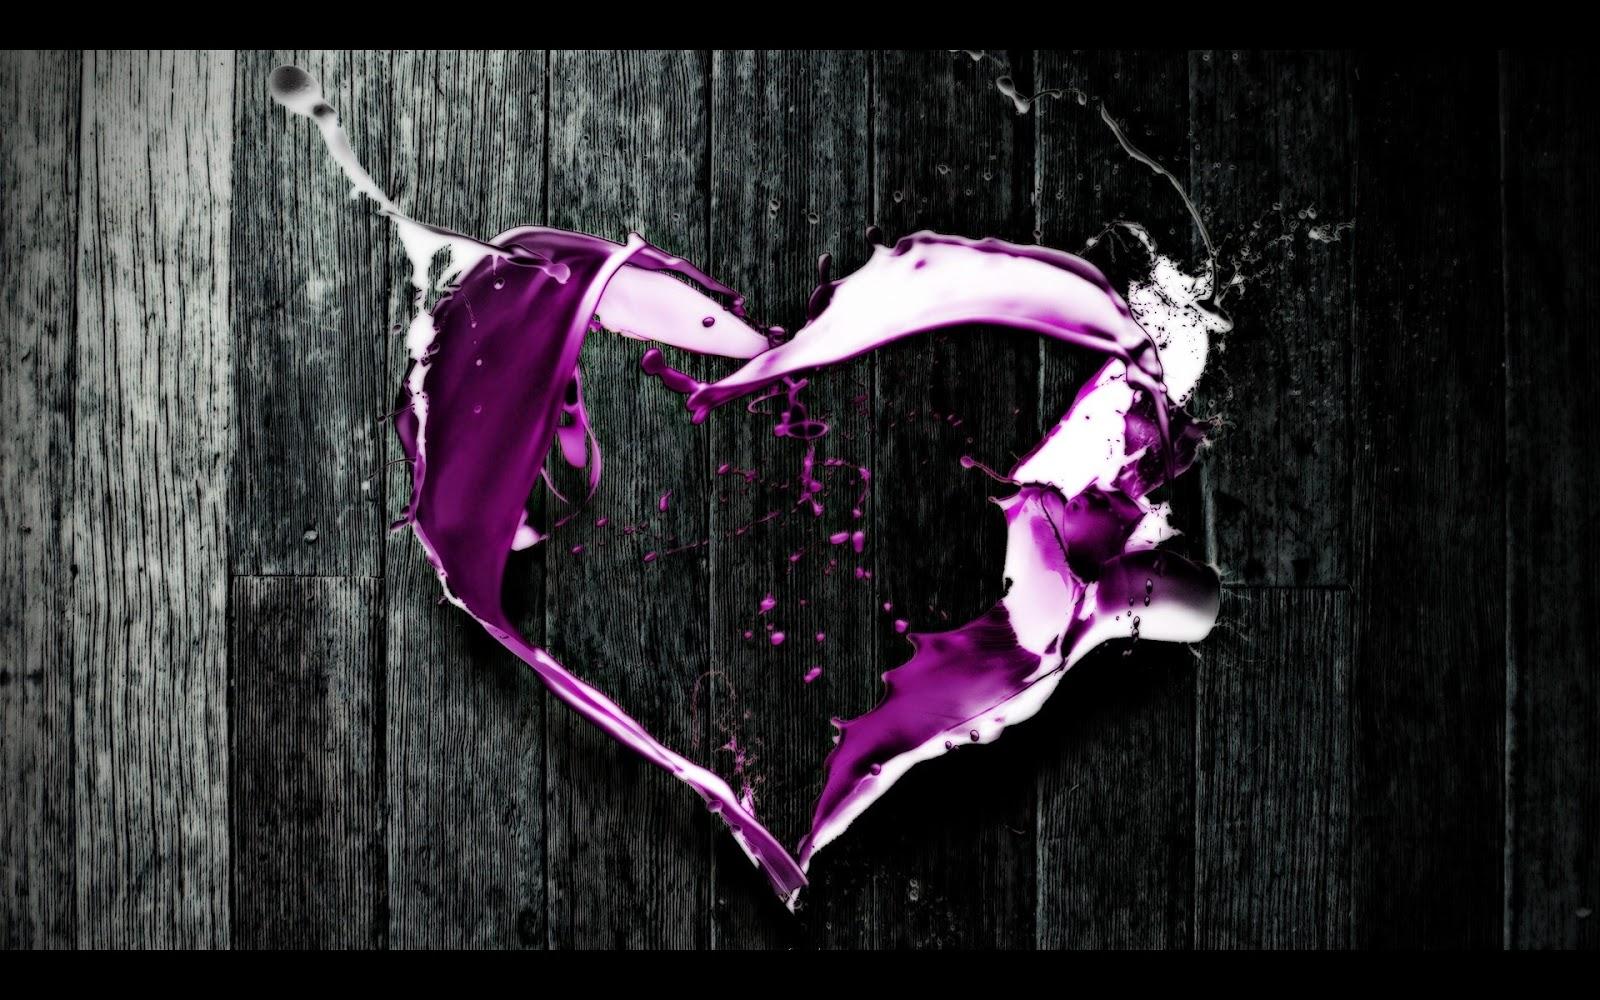 Purple heart abstract art hd wallpaper love wallpapers - Wallpaper 0f love ...